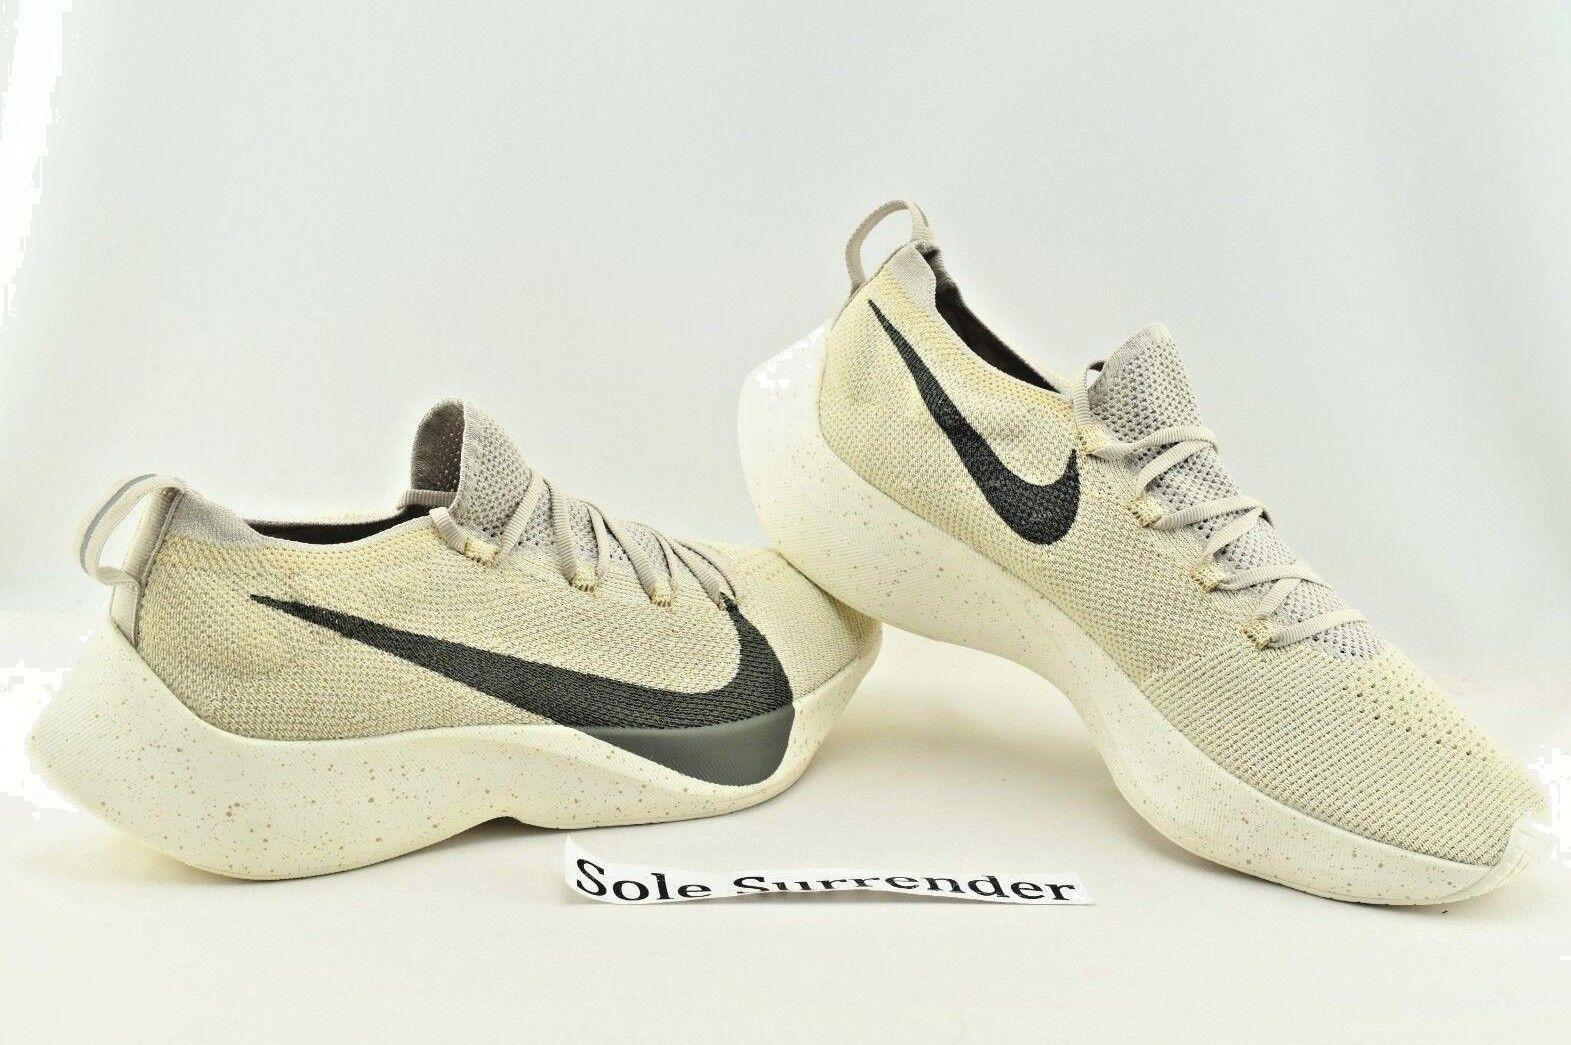 91bb5e0a40e4 Mens Nike Vapor Street Flyknit String River Rock Aq1763-200 US 10.5 ...